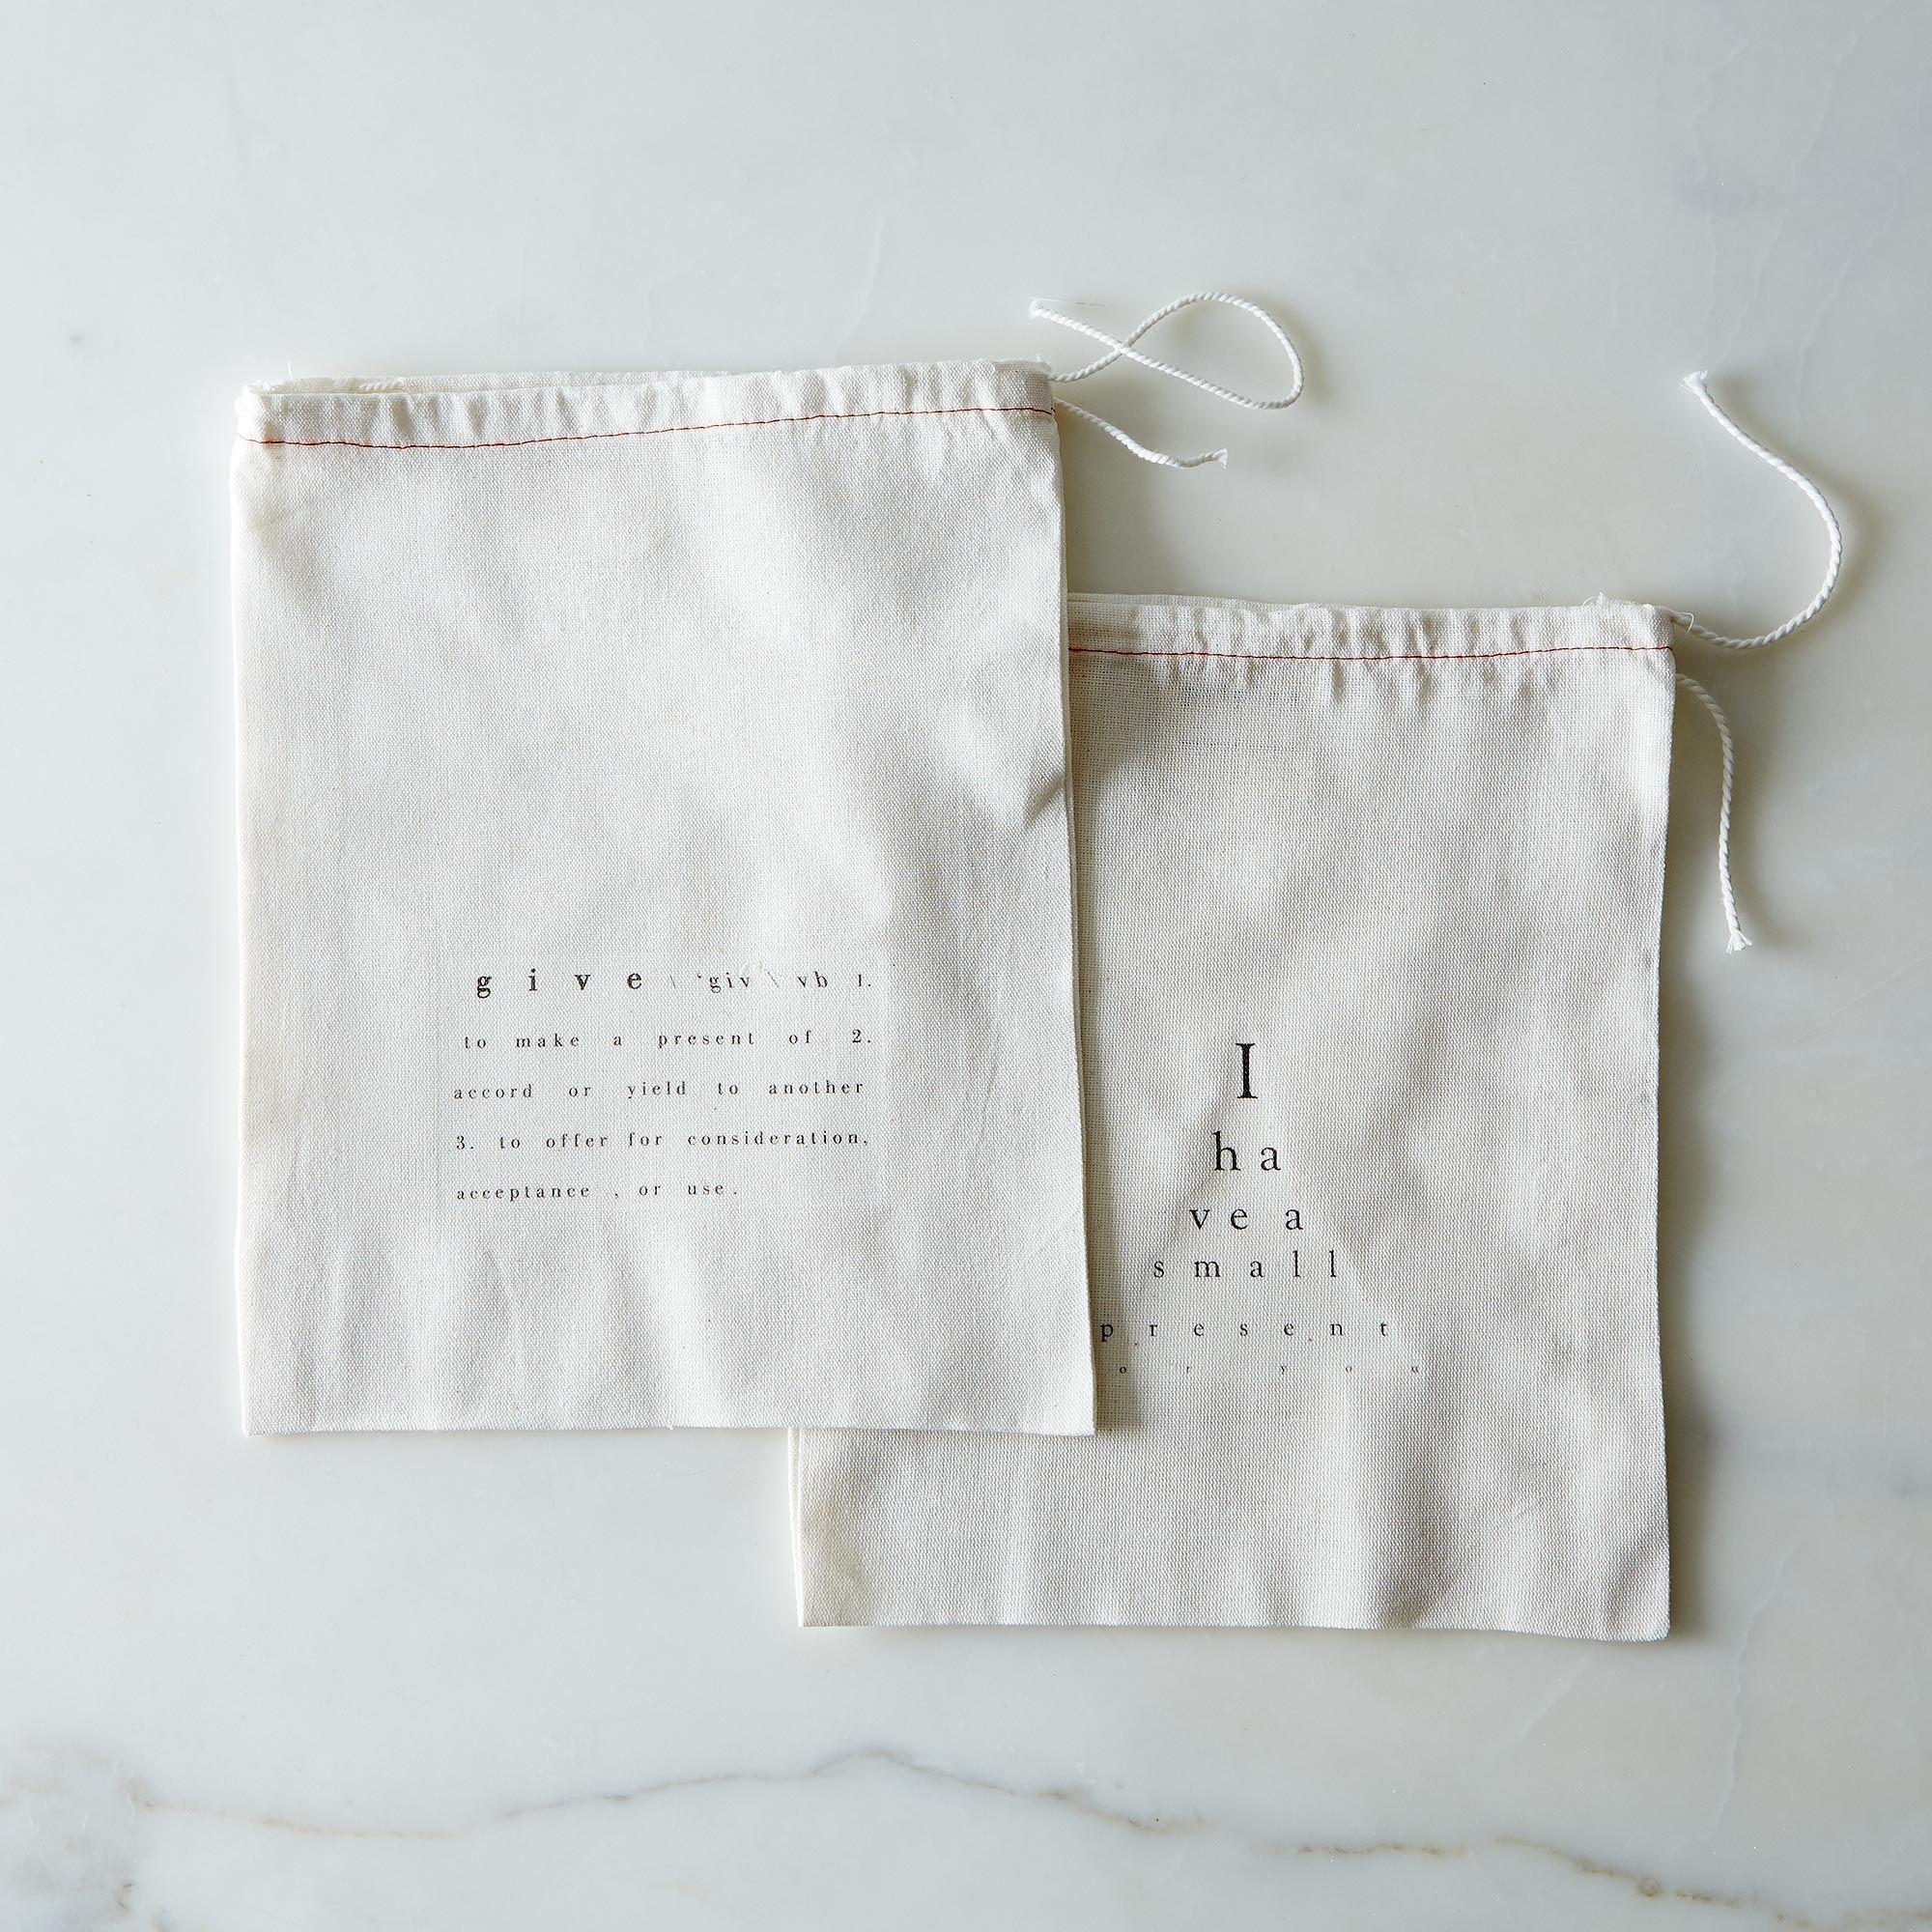 E2f44d5e a08a 4908 a979 2b1131bf989e  2014 1119 pi lo cotton printed gift bags 005